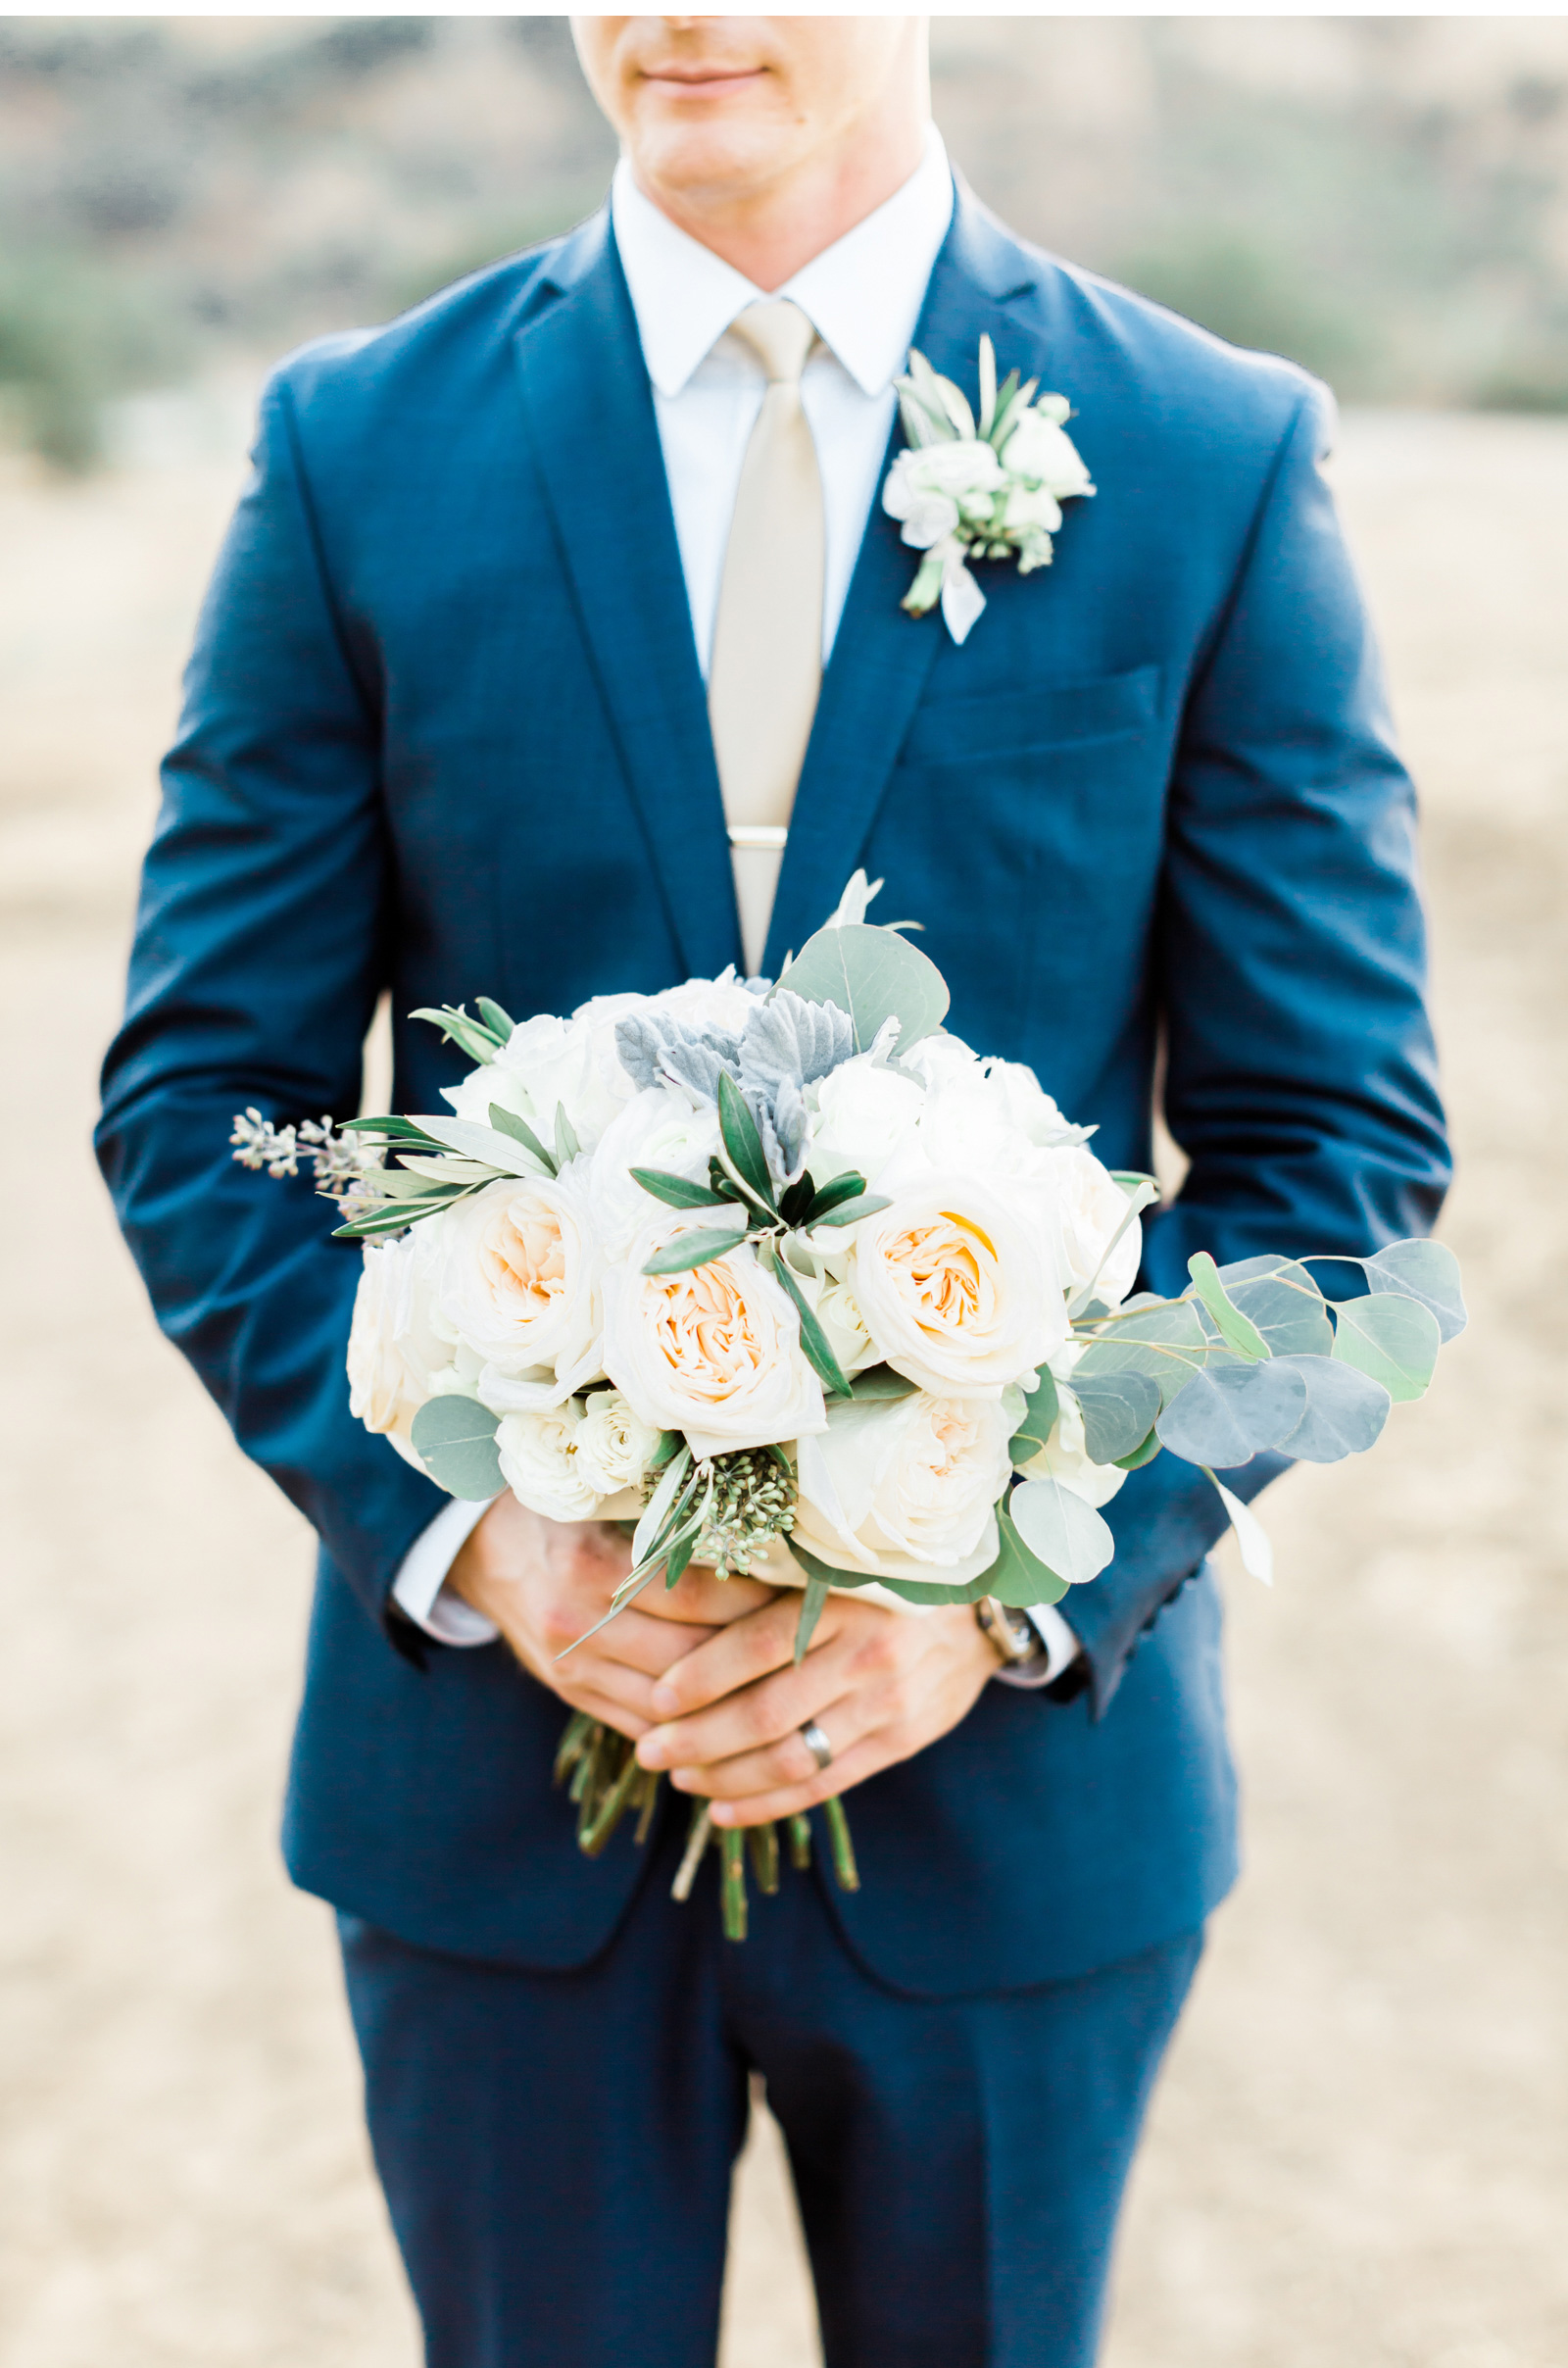 California-Wedding-Photographer-Style-Me-Pretty-Natalie-Schutt-San-Luis-Obispo_10.jpg